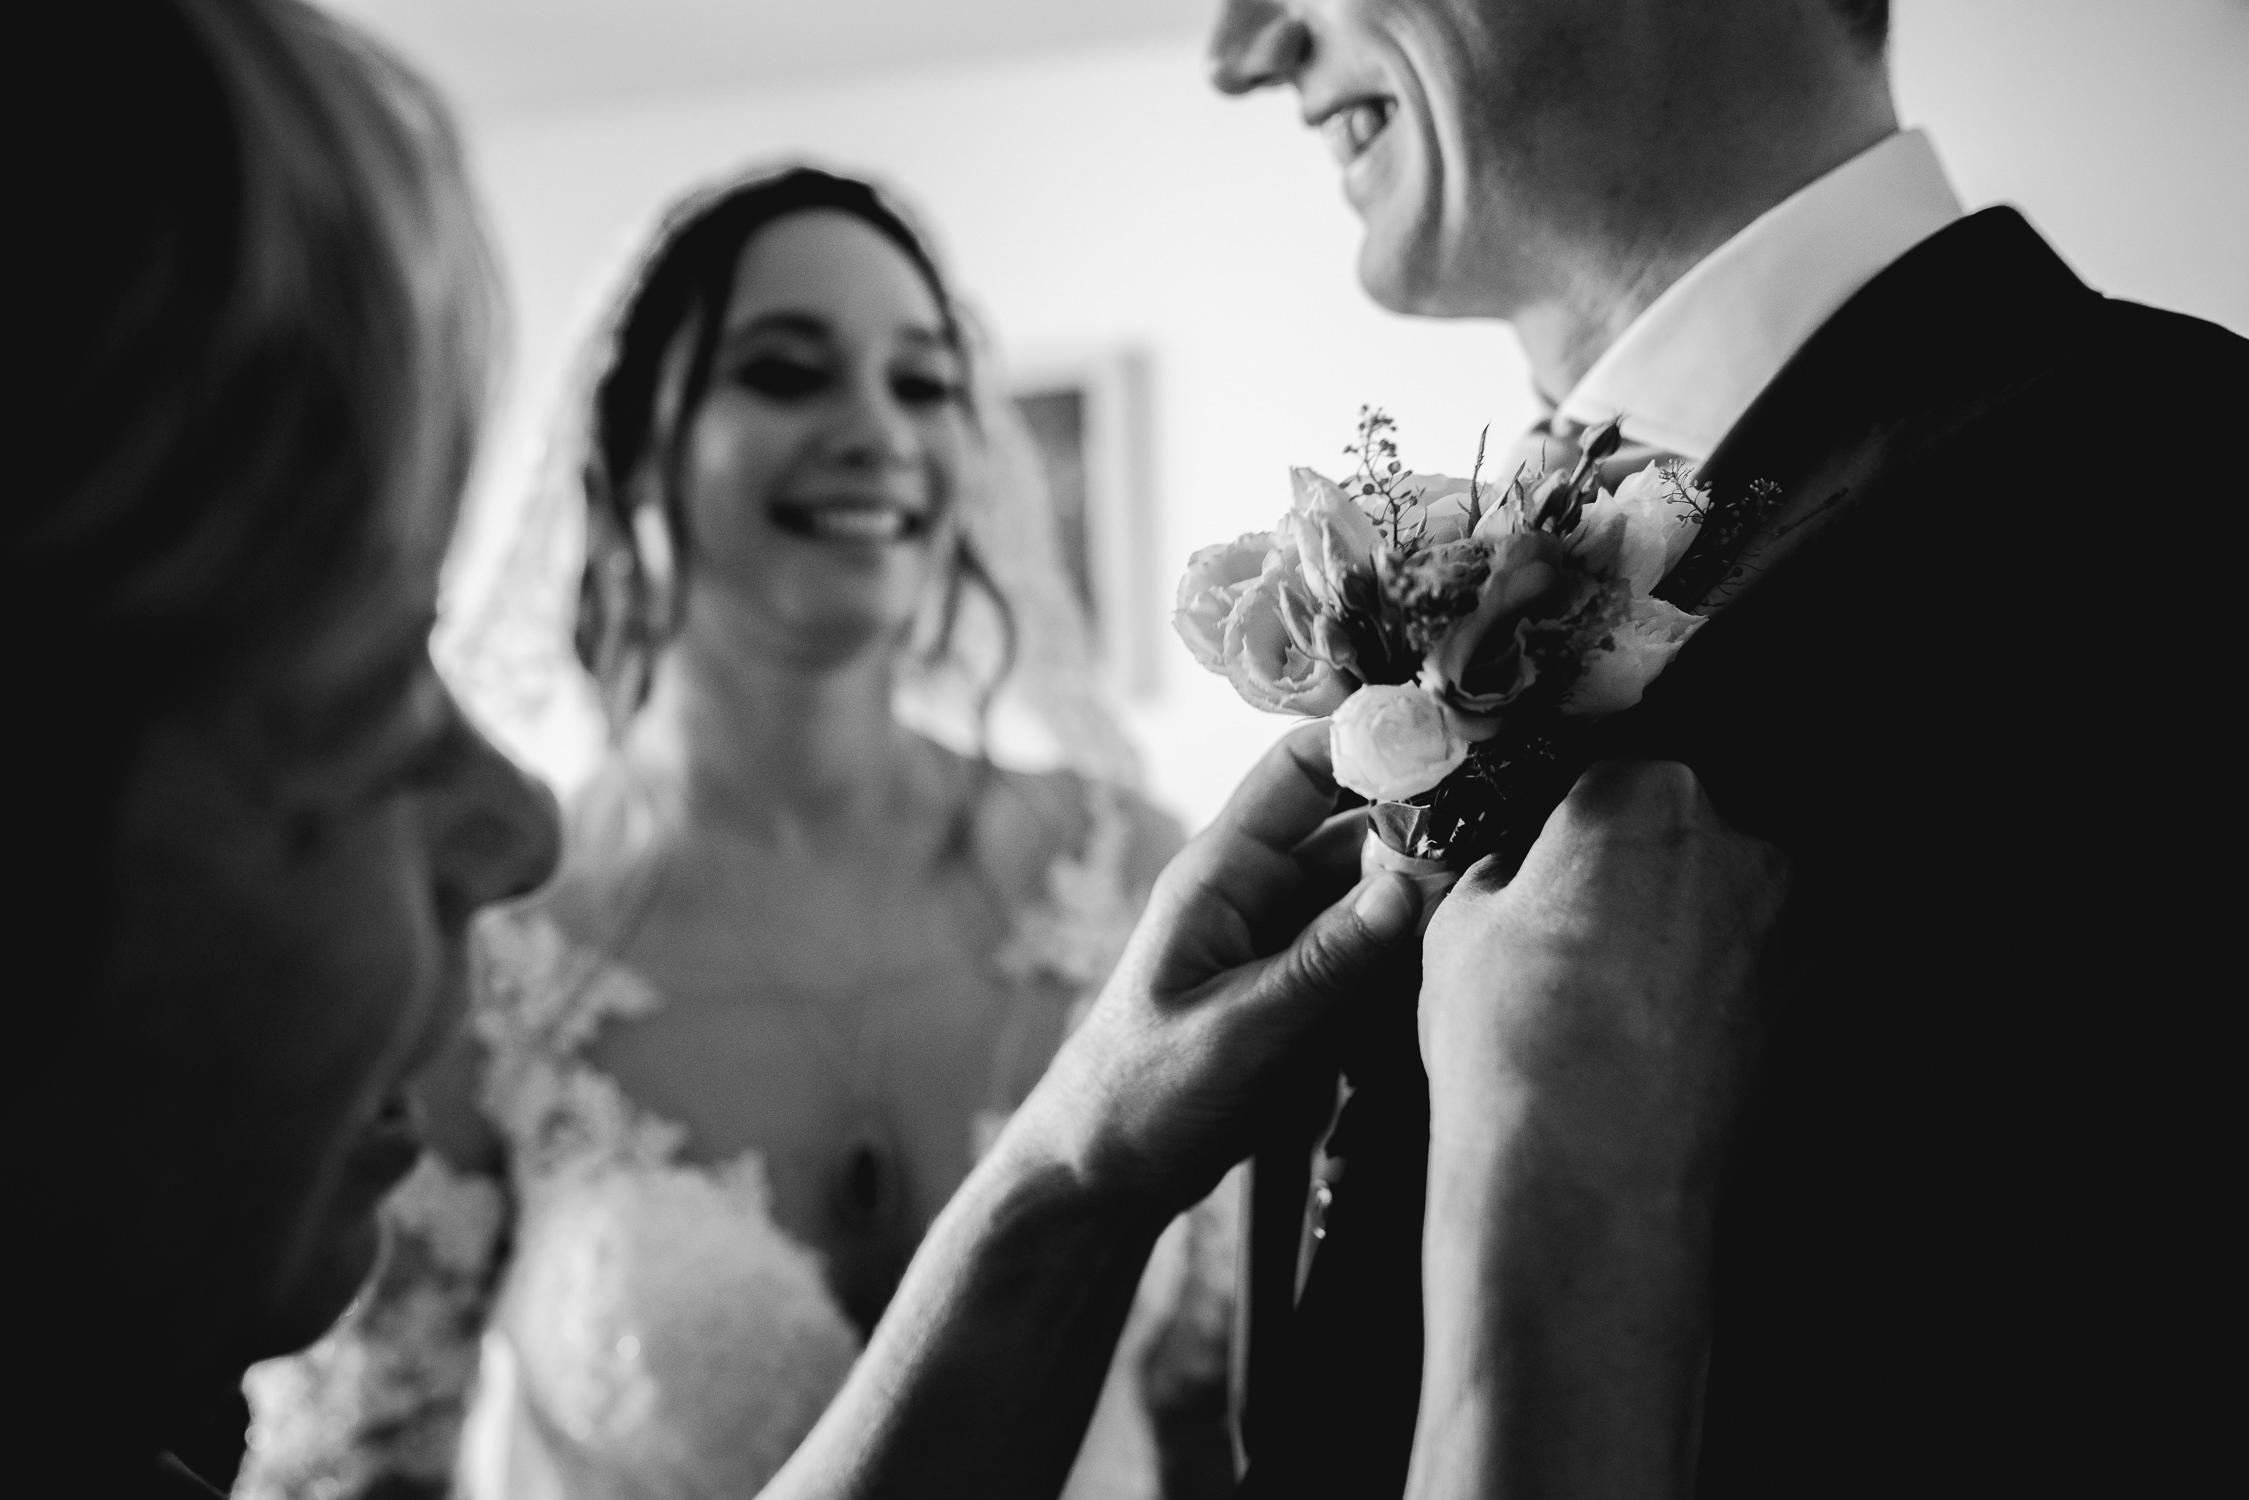 bruidsfotografie-amsterdam-utrecht-trouwfotograaf-mark-hadden-wedding-photography-Robin & Guus-010-2.jpg